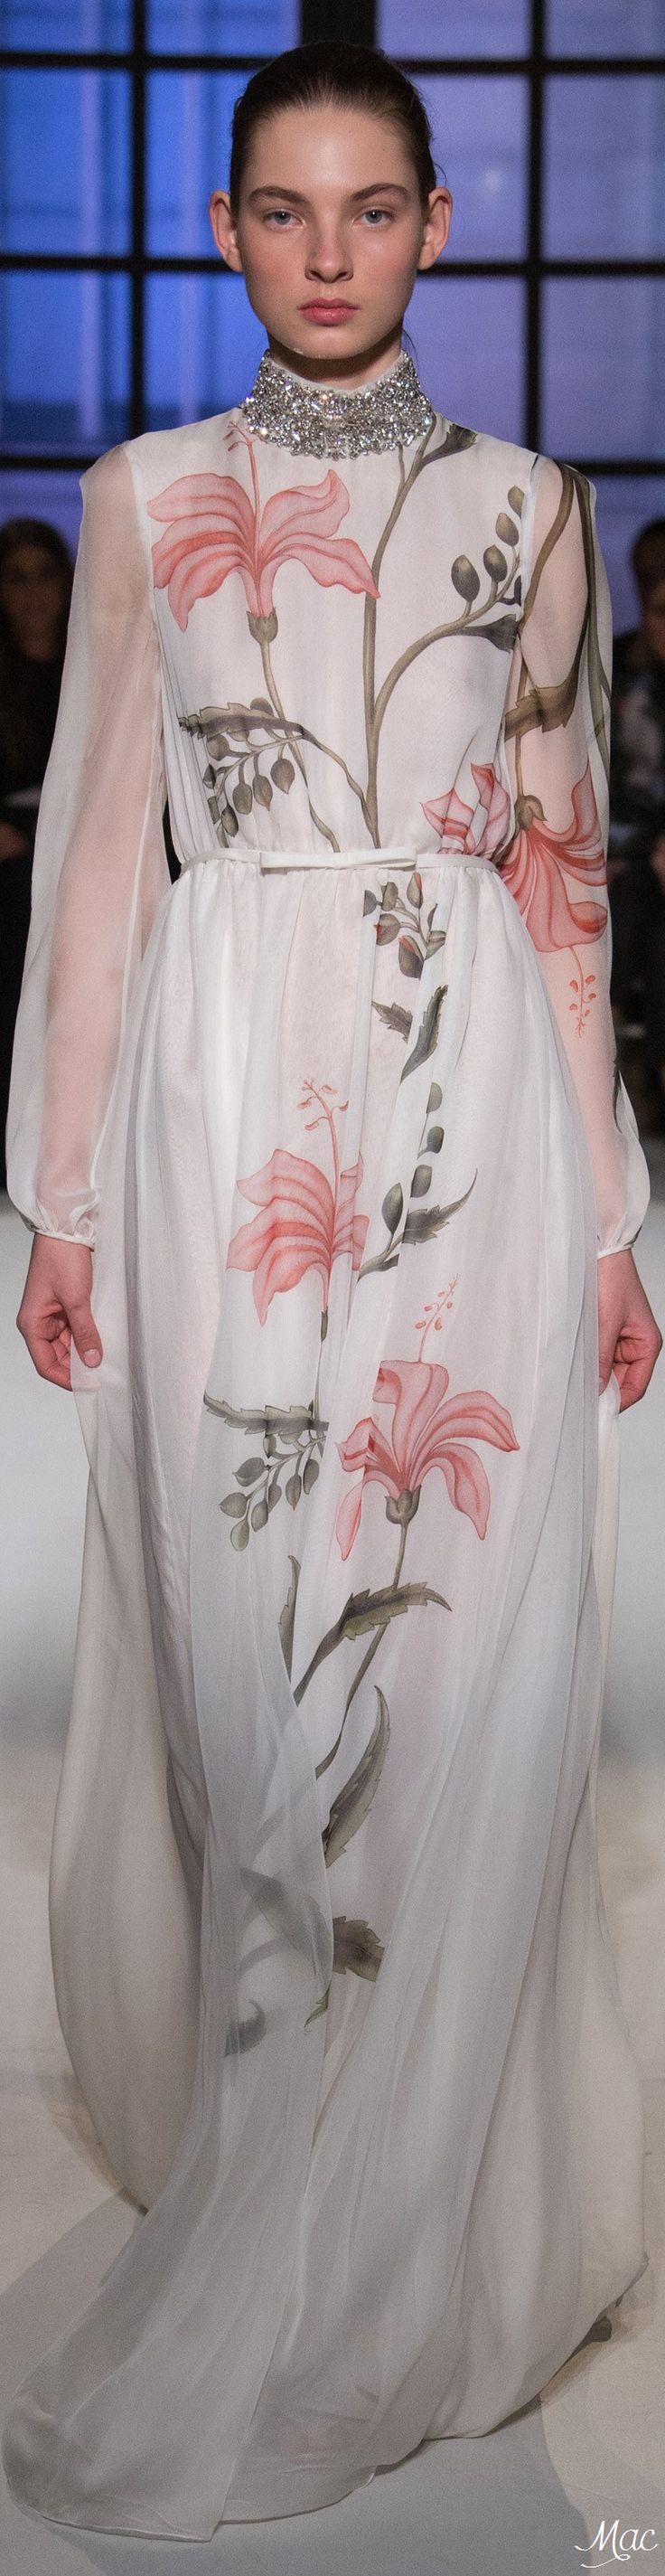 Spring 2017 Haute Couture Giambattista Valli